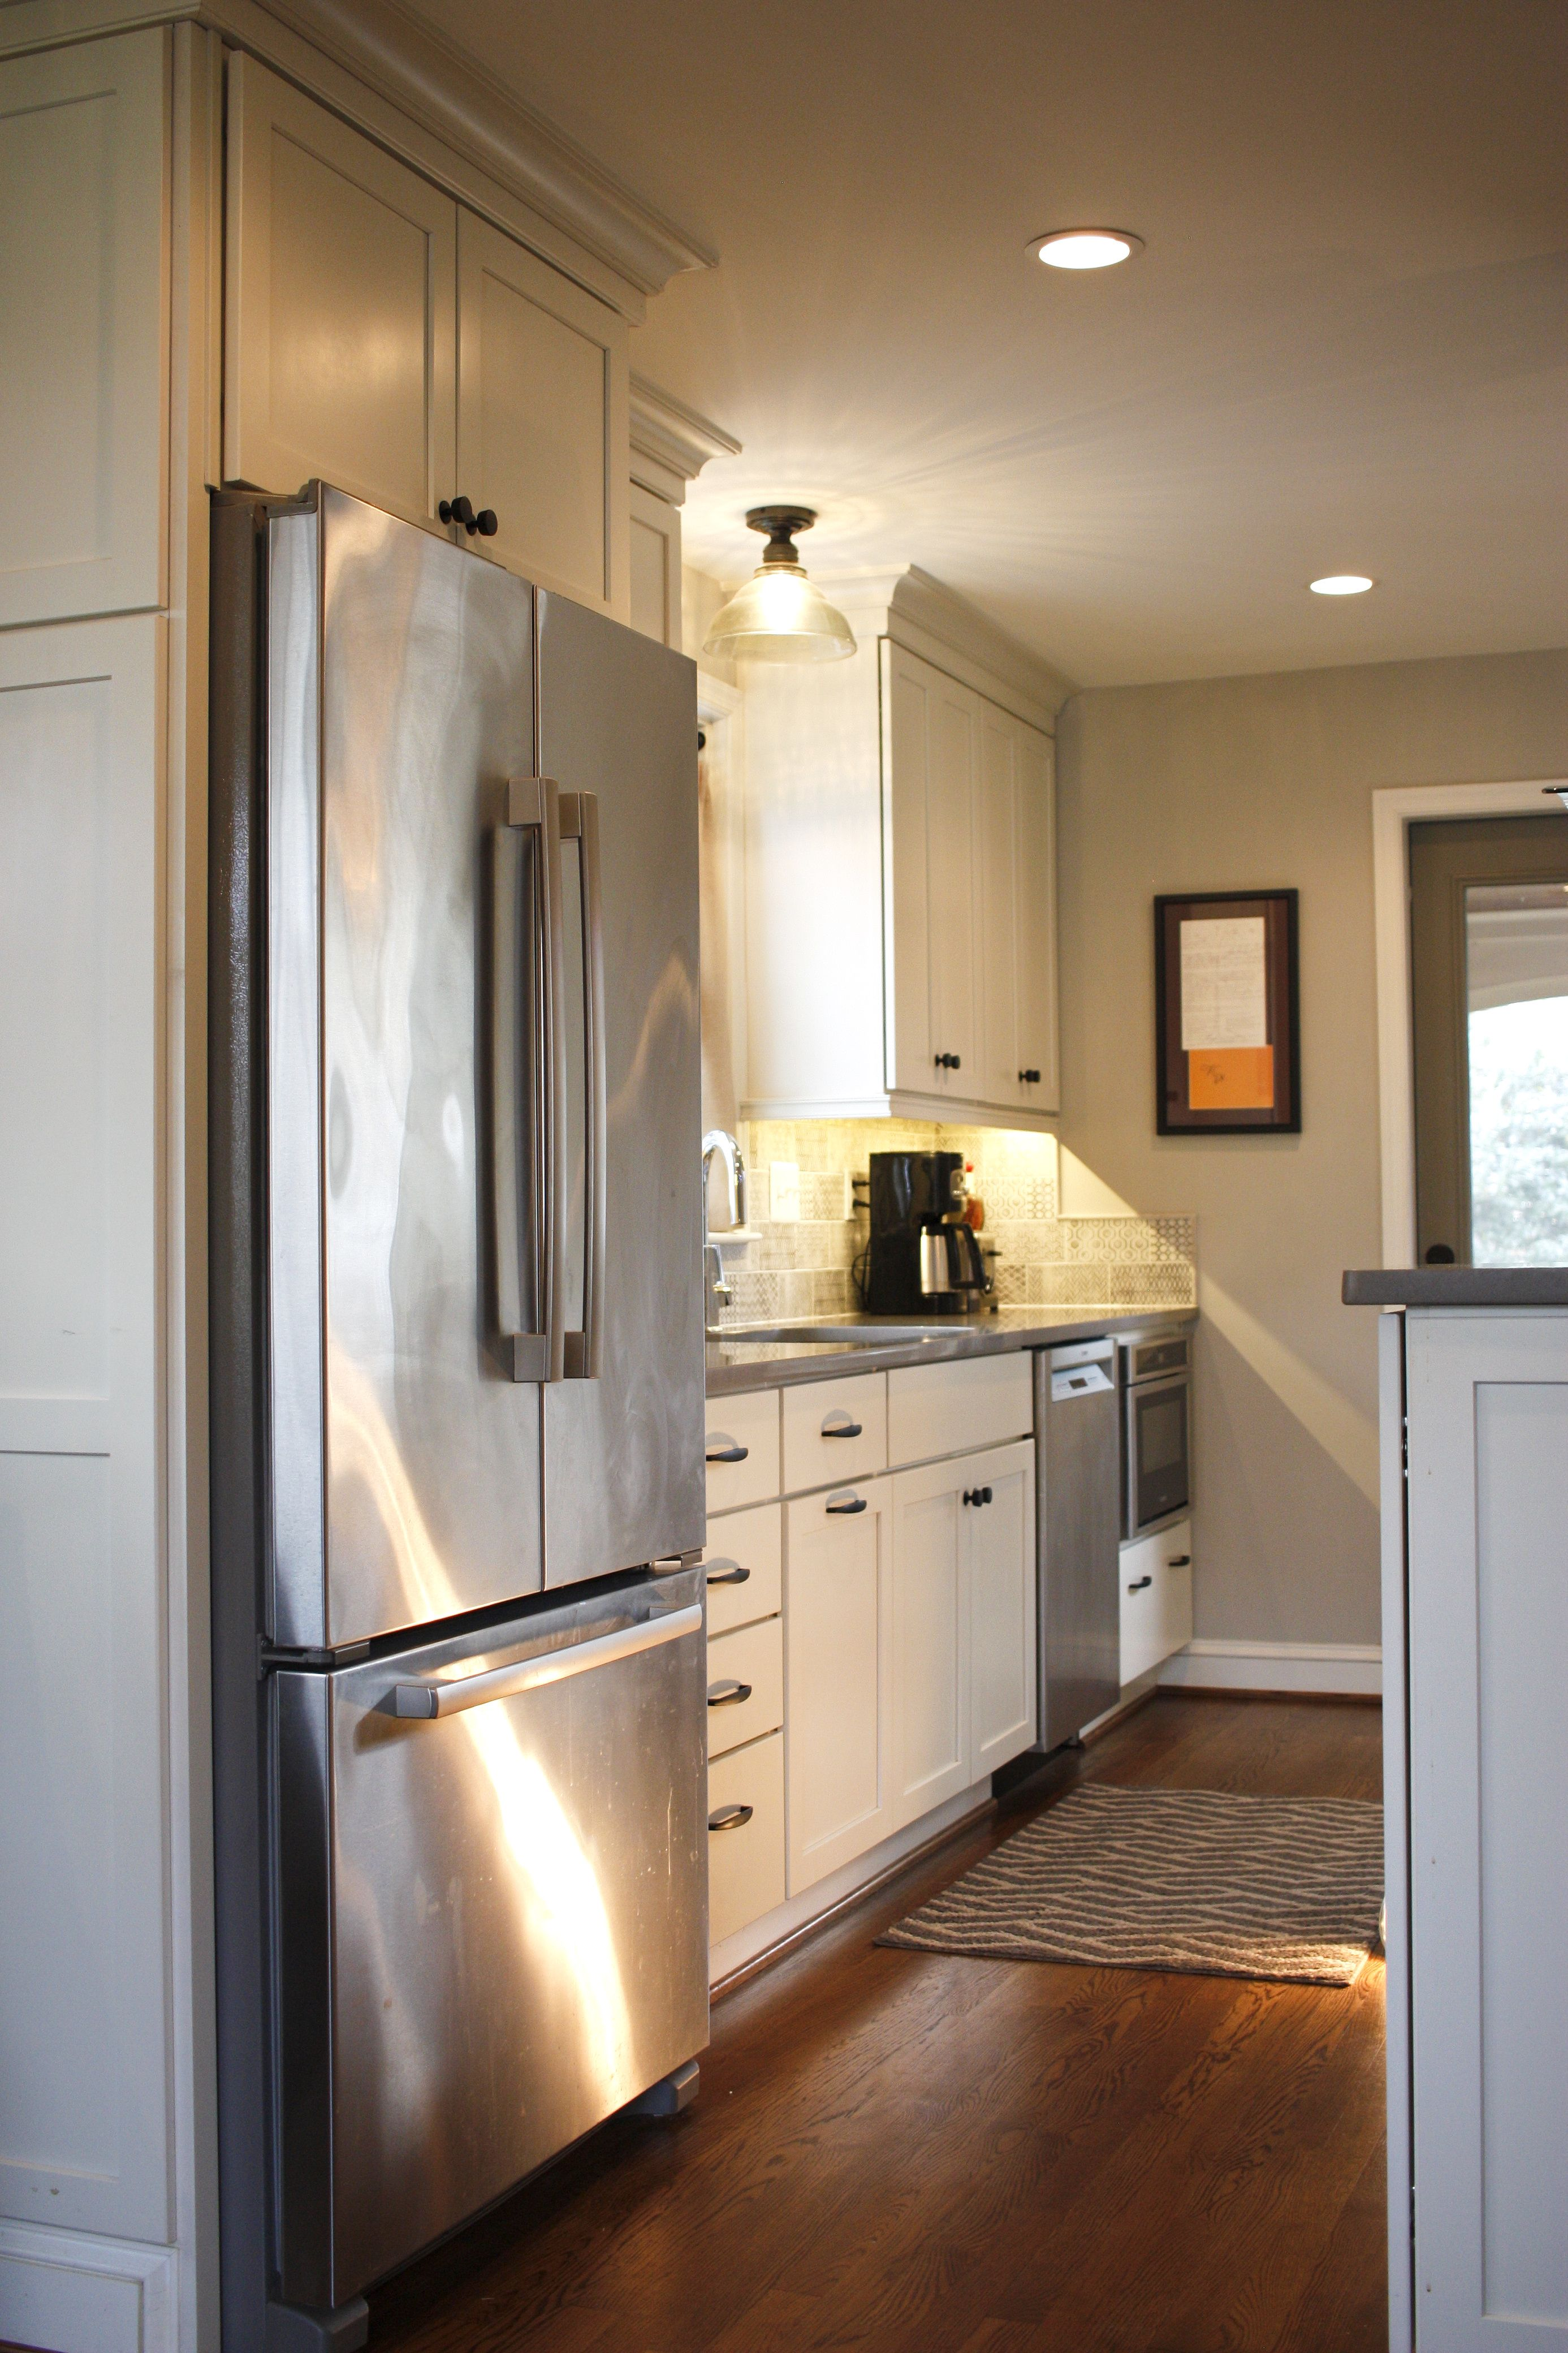 Traditional Kitchen In Baltimore Md Kitchen Cabinets Kitchen Kitchen Facelift